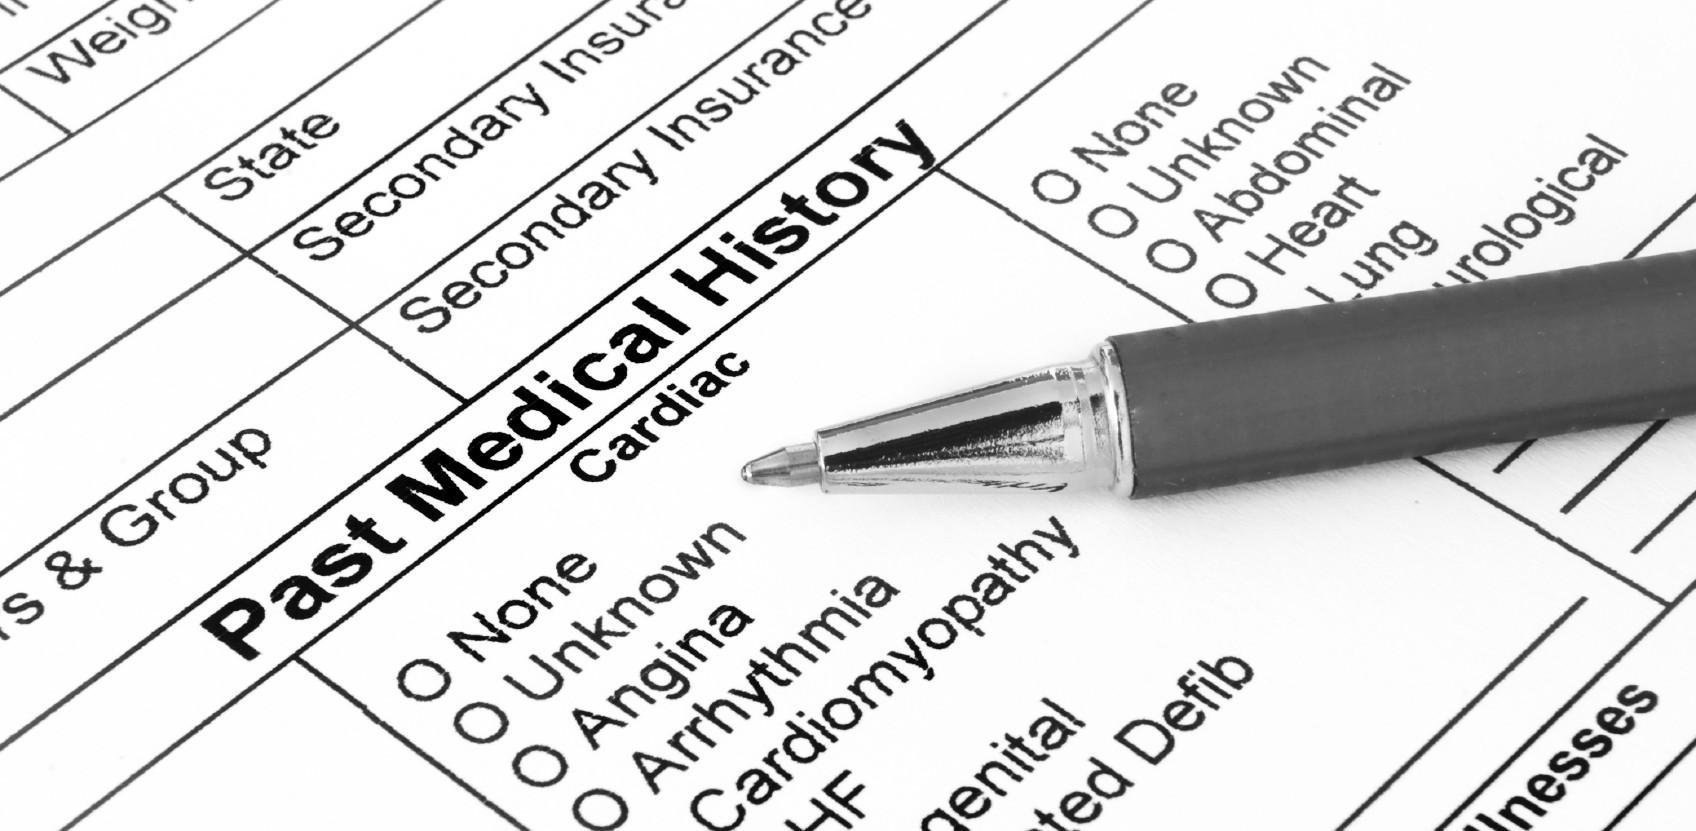 Patient Overdose Underscores Importance of Thorough Communication on Patient History